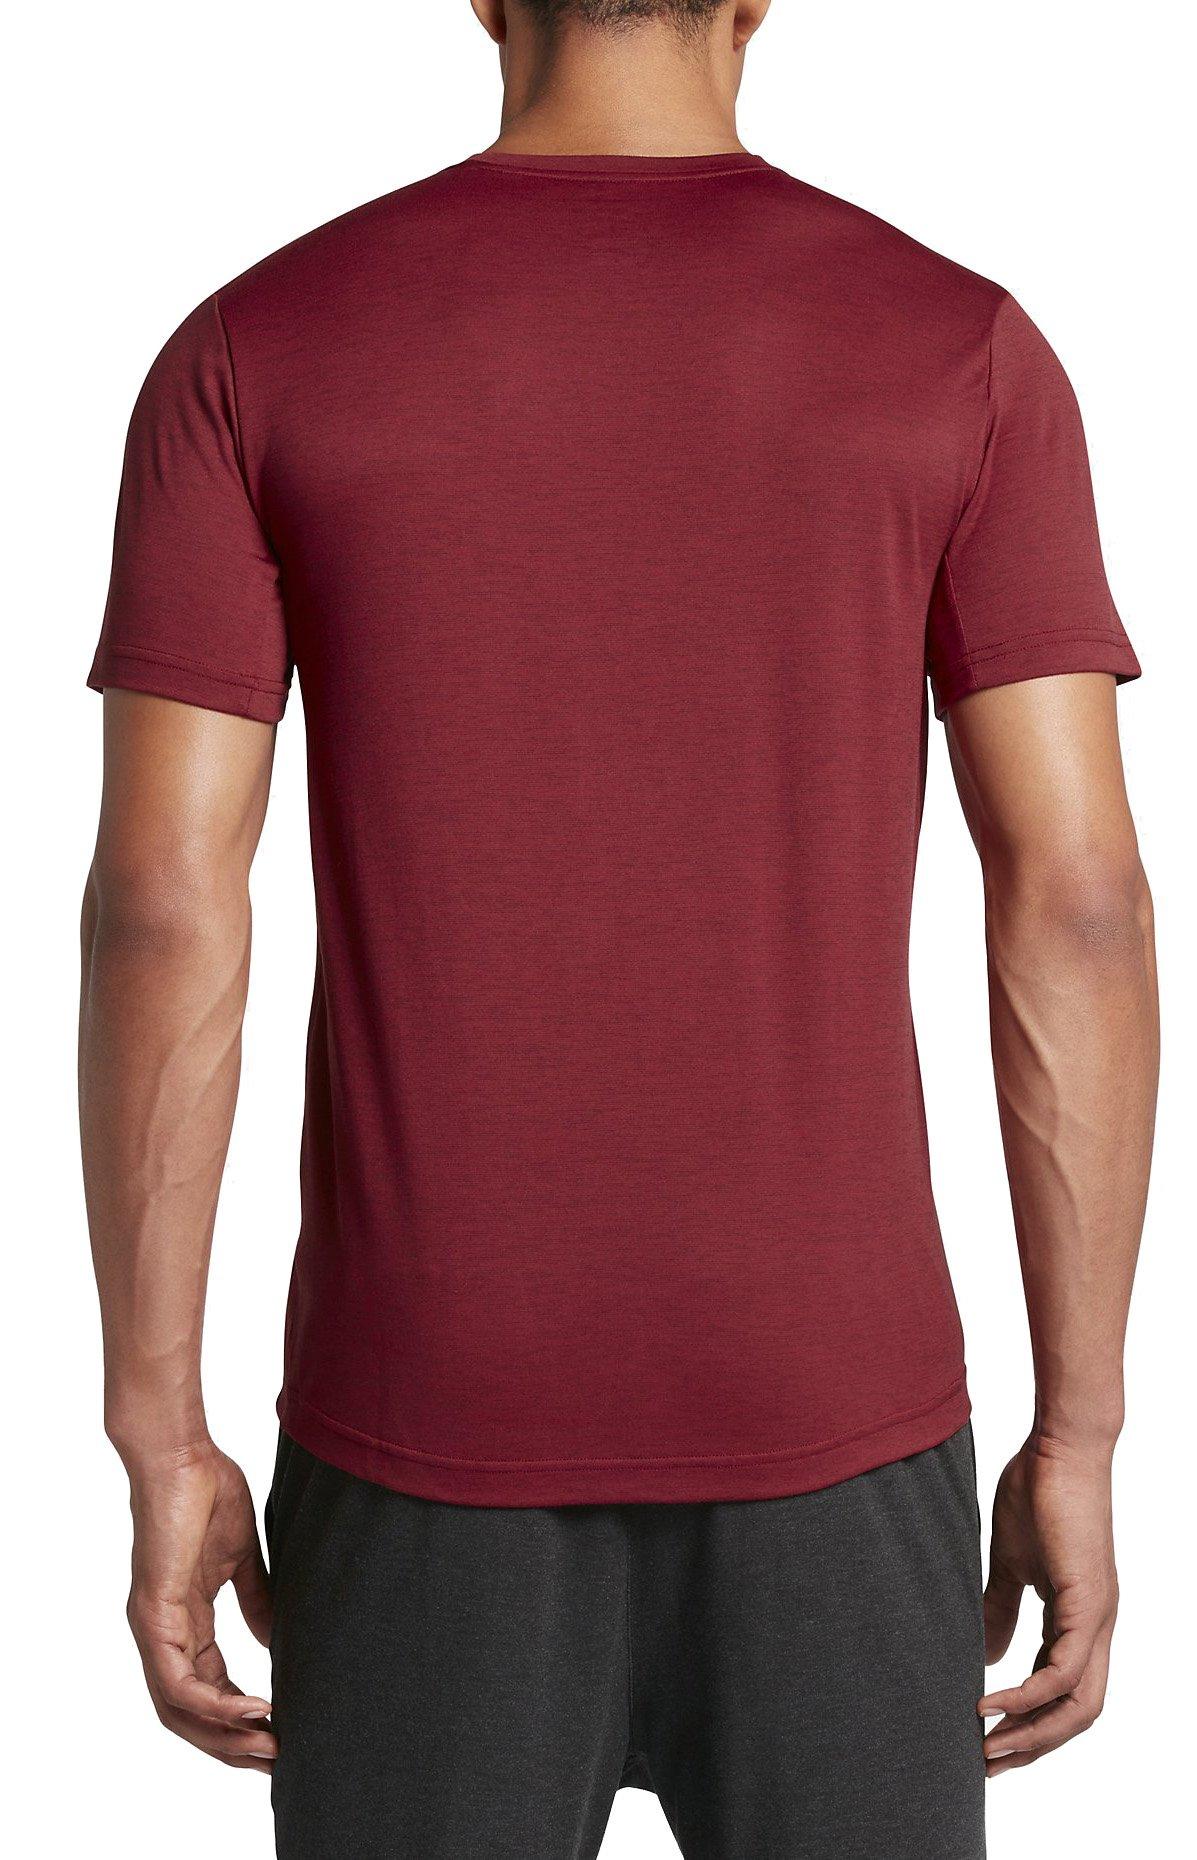 742228 681 Nike Dri-fit Touch Ultra Soft Men/'s Training Shirt